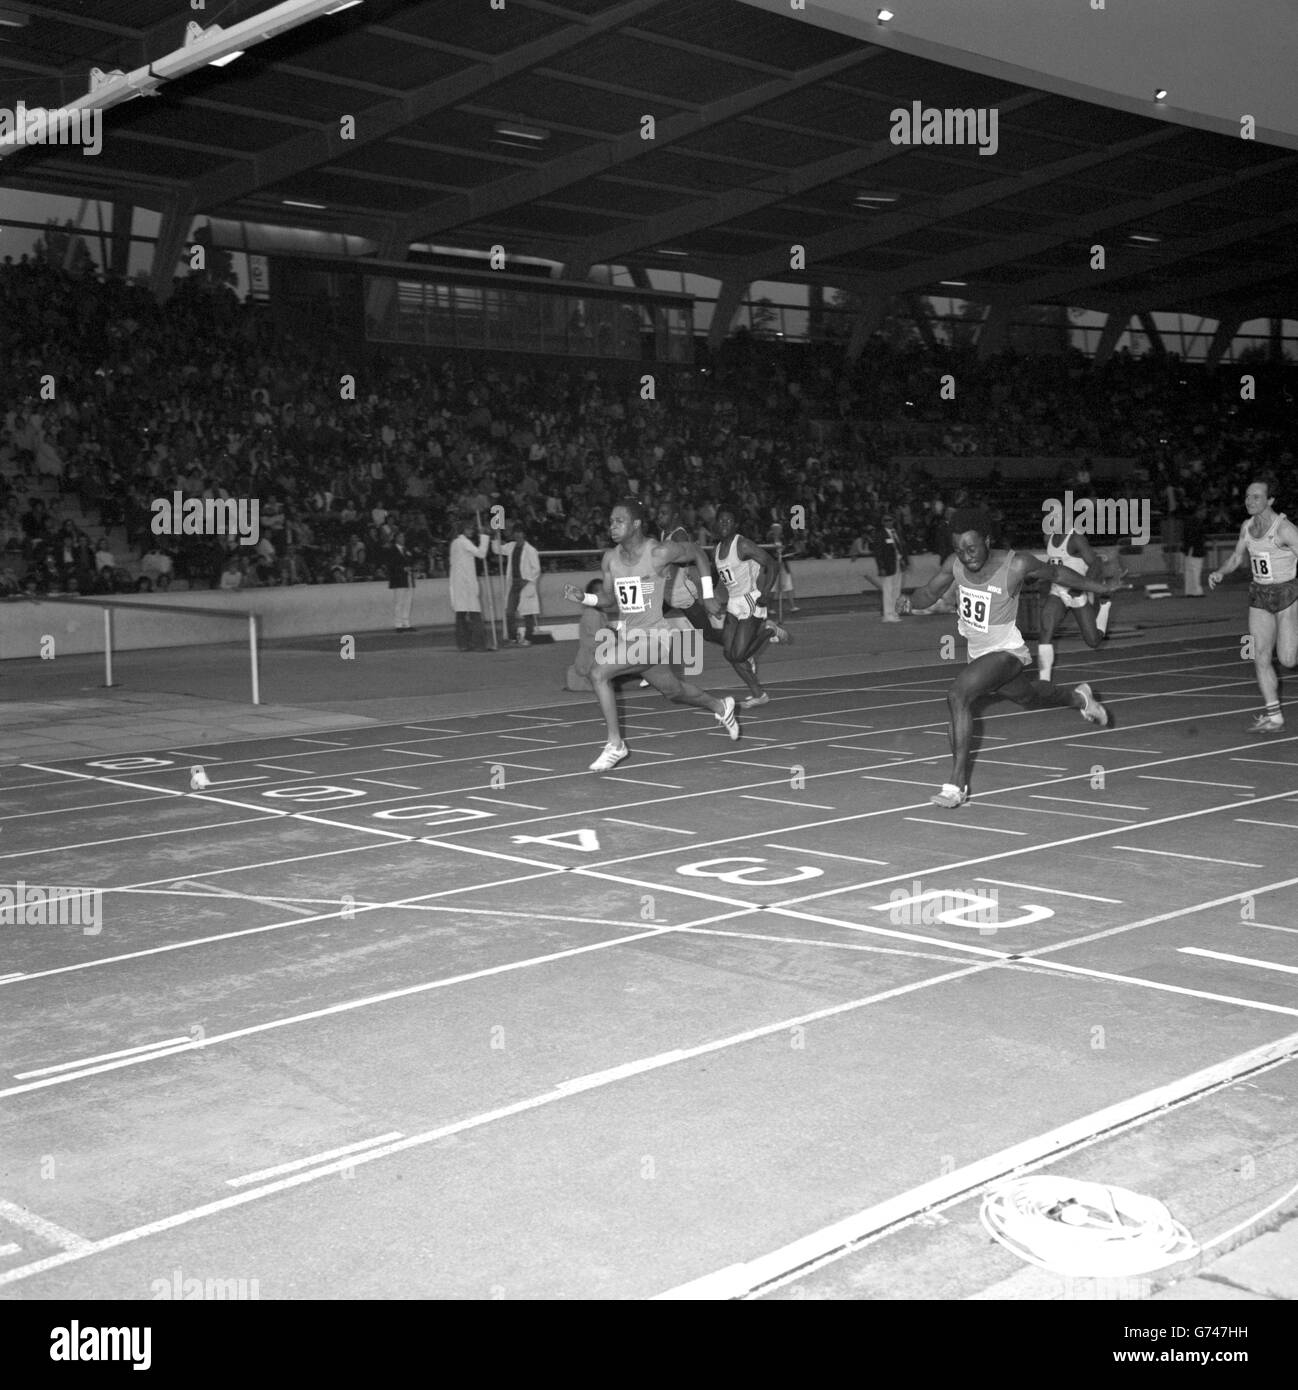 athletics 100m crystal palace national sports centre. Black Bedroom Furniture Sets. Home Design Ideas